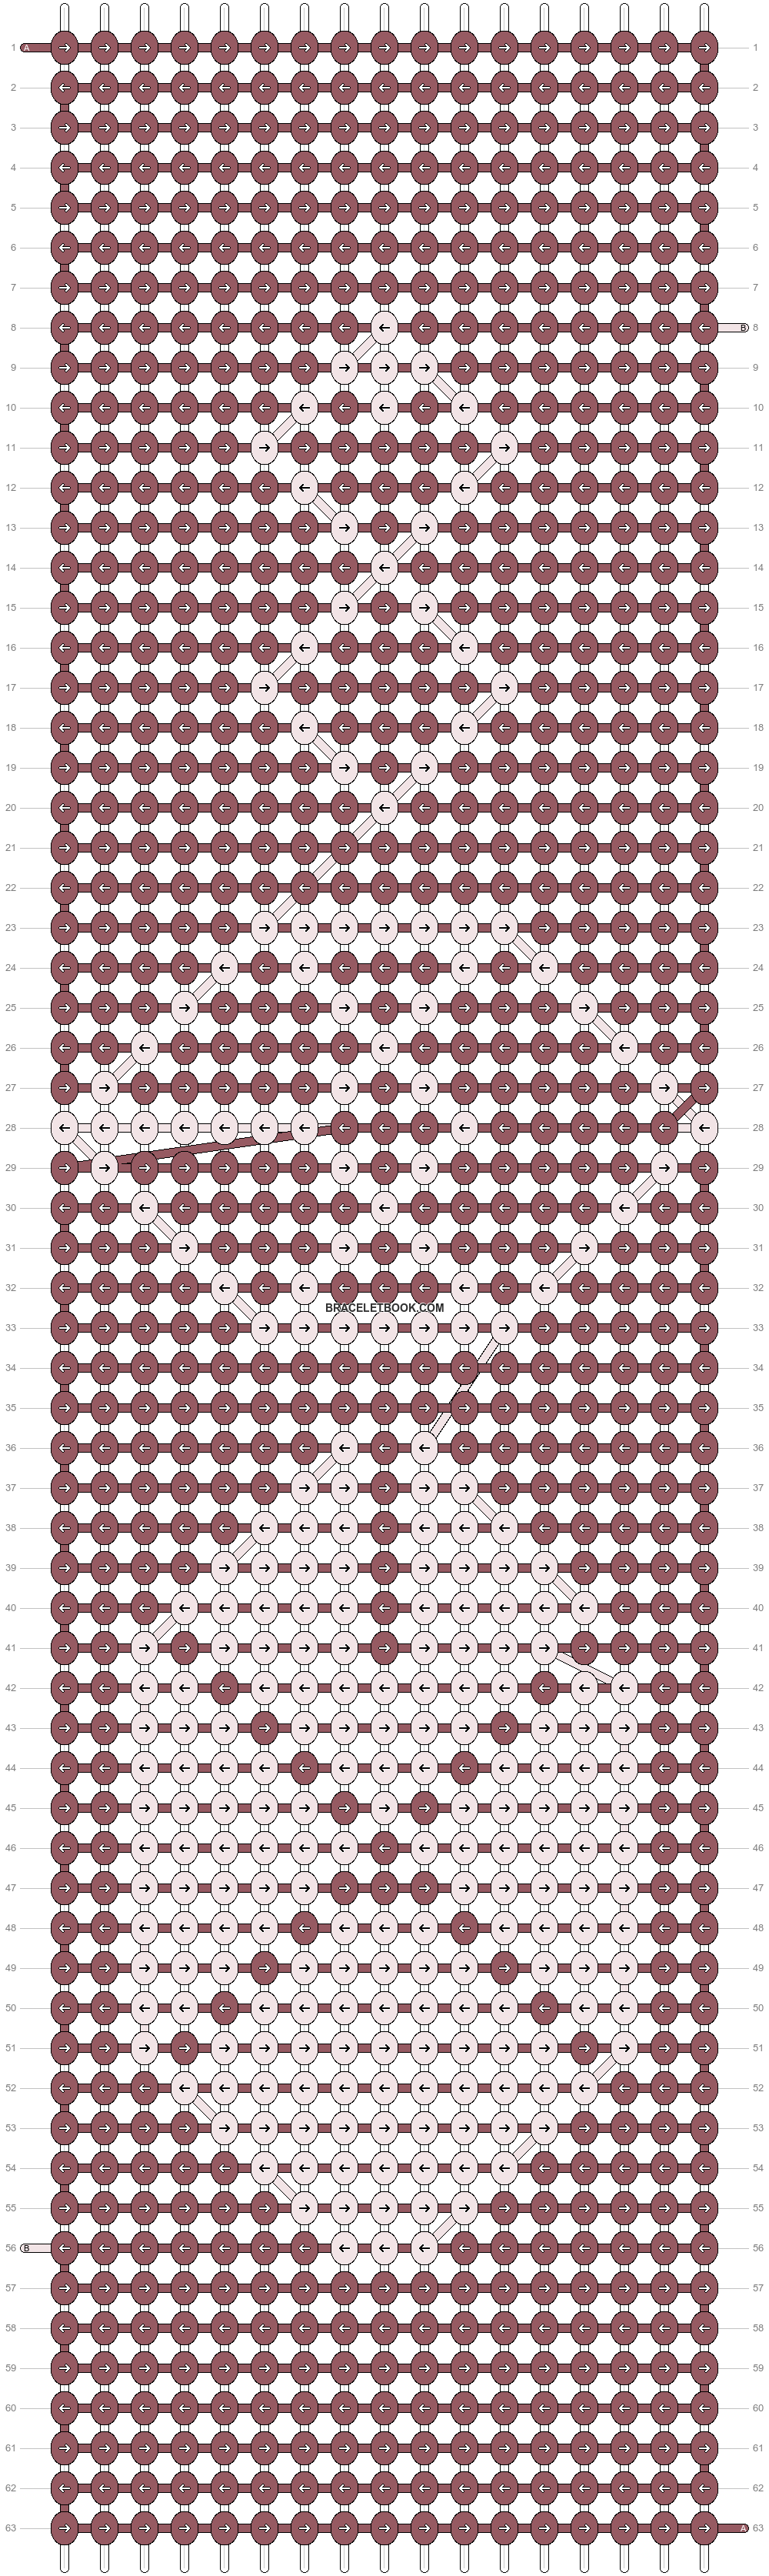 Alpha Pattern #22186 added by inudii